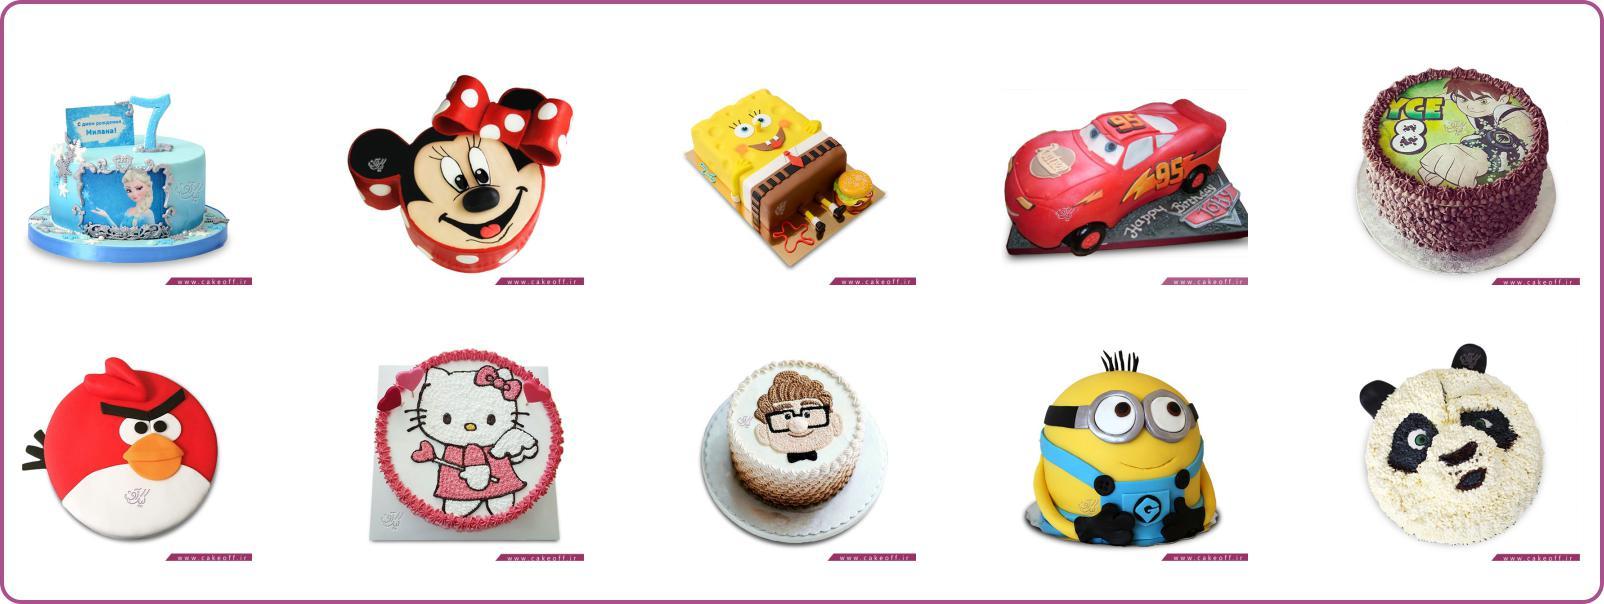 کیک های تم شخصیت کارتونی